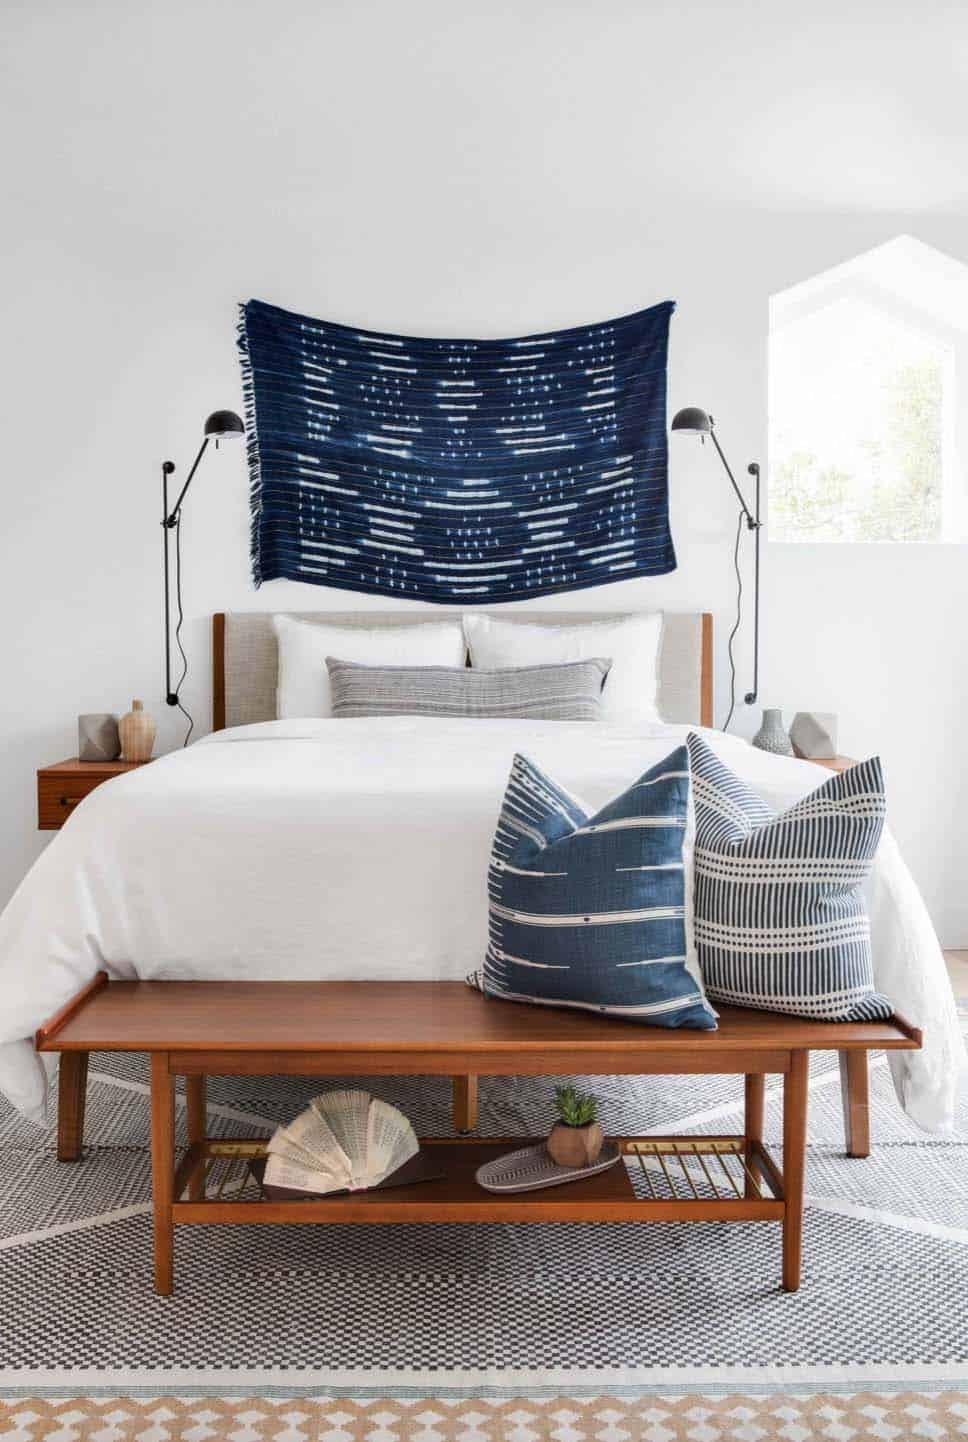 California Eclectic Home-Lindye Galloway Interiors-21-1 Kindesign